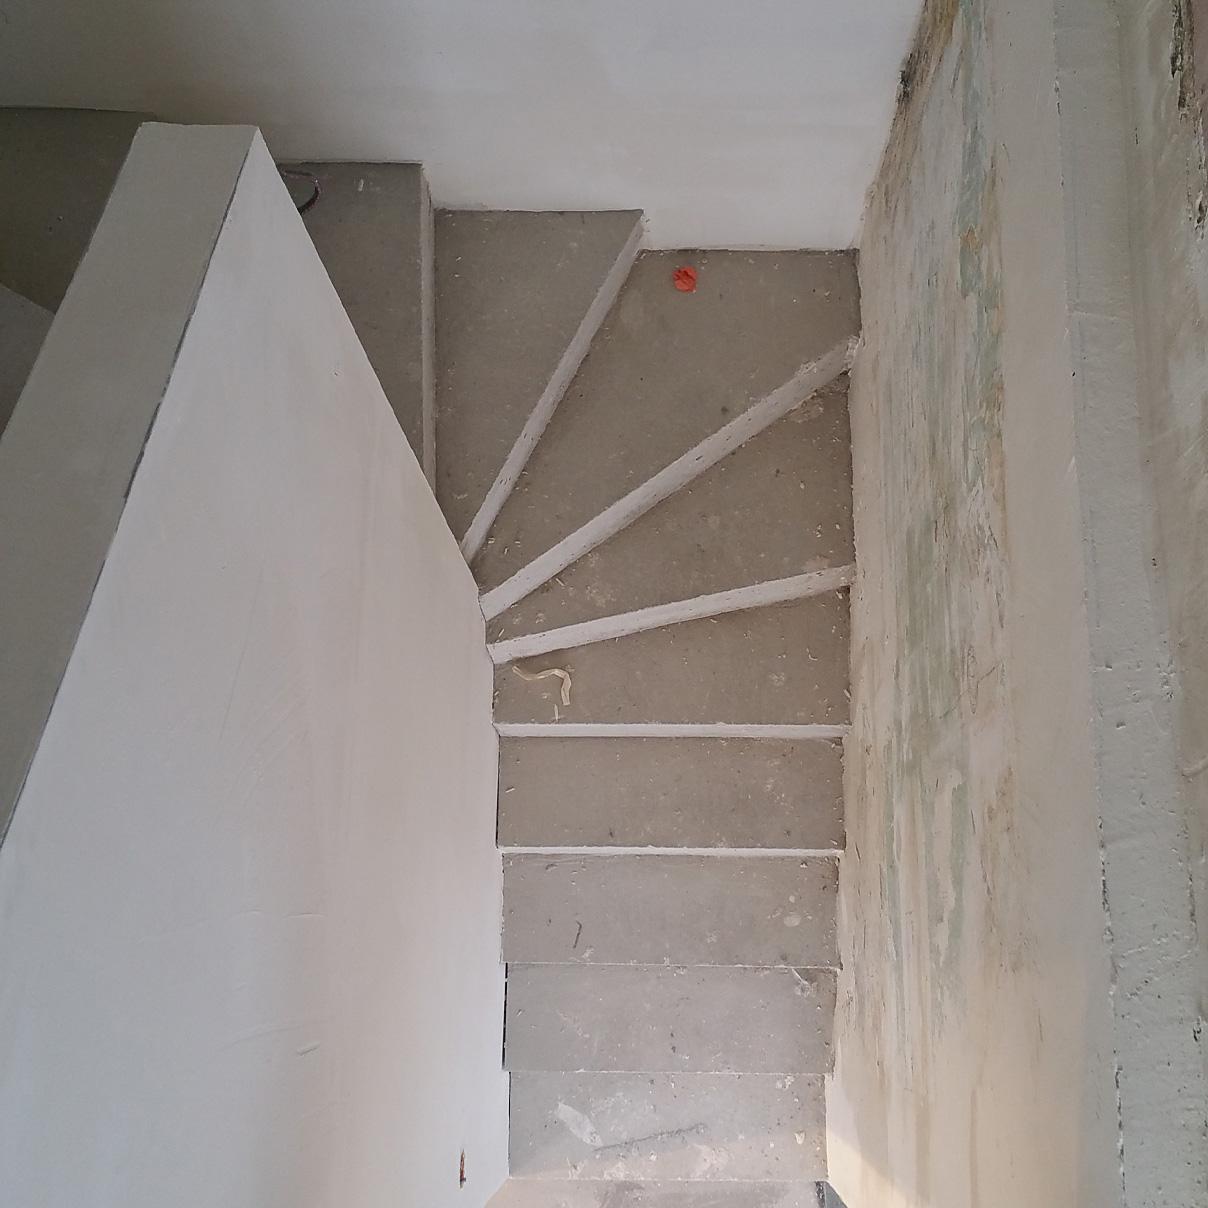 masKarade-architecture-maison-individuelle-rehabilitation-extension-paris-facade-vitree-isolation-ecologique